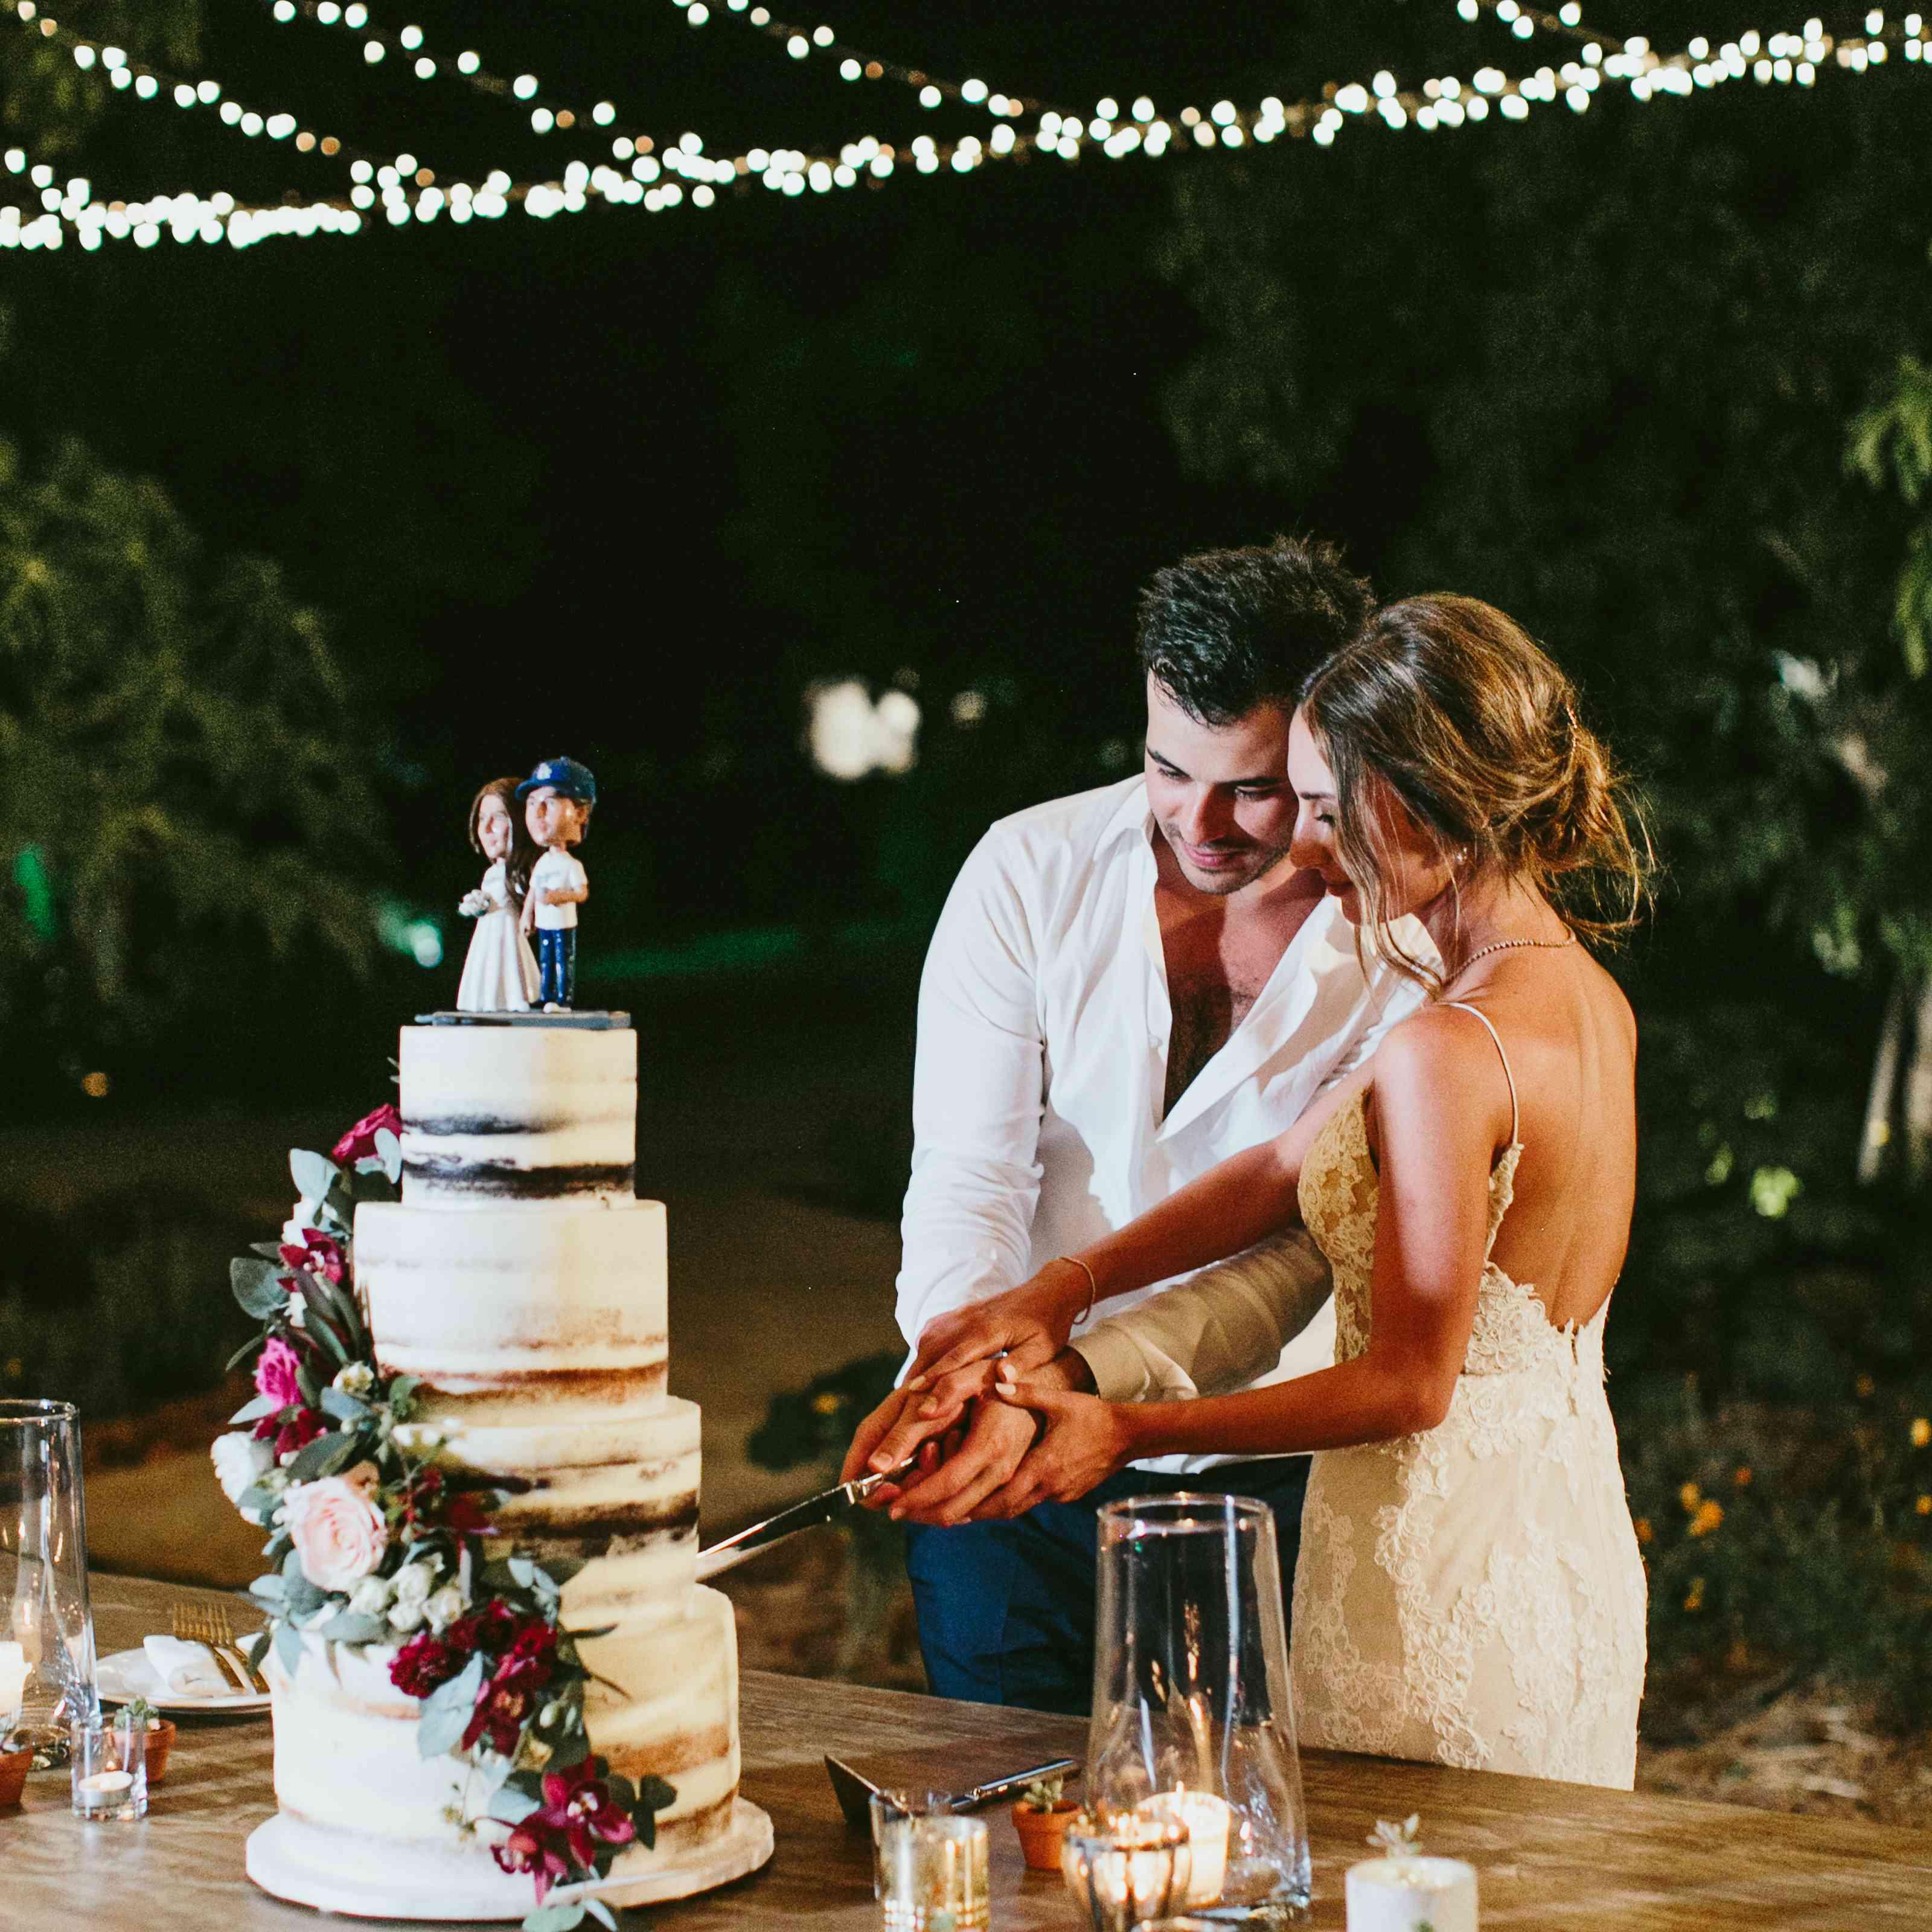 <p>cake cutting</p><br><br>